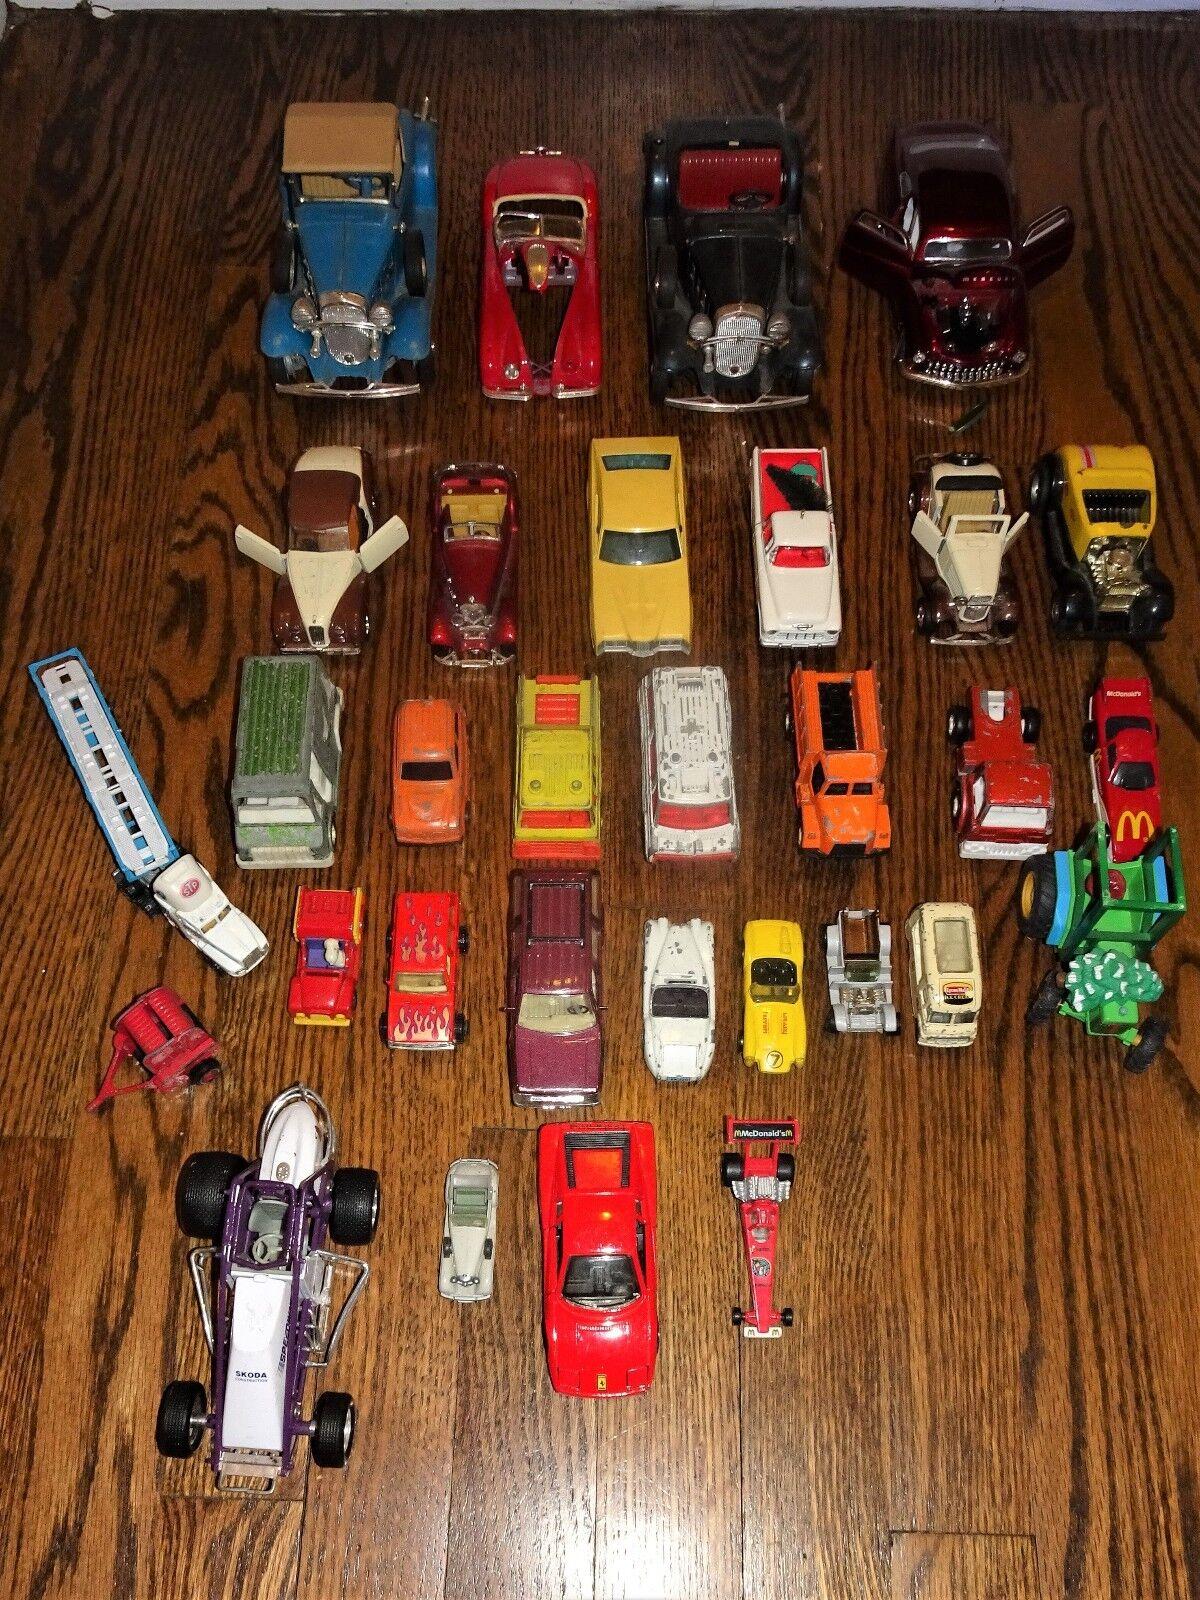 Masse-COLLECTIBLE DIE CAST-PLASTIC-TOOTSIE, OTHER Spielzeug VEHICLES-Autos-TRUCKS AS IS